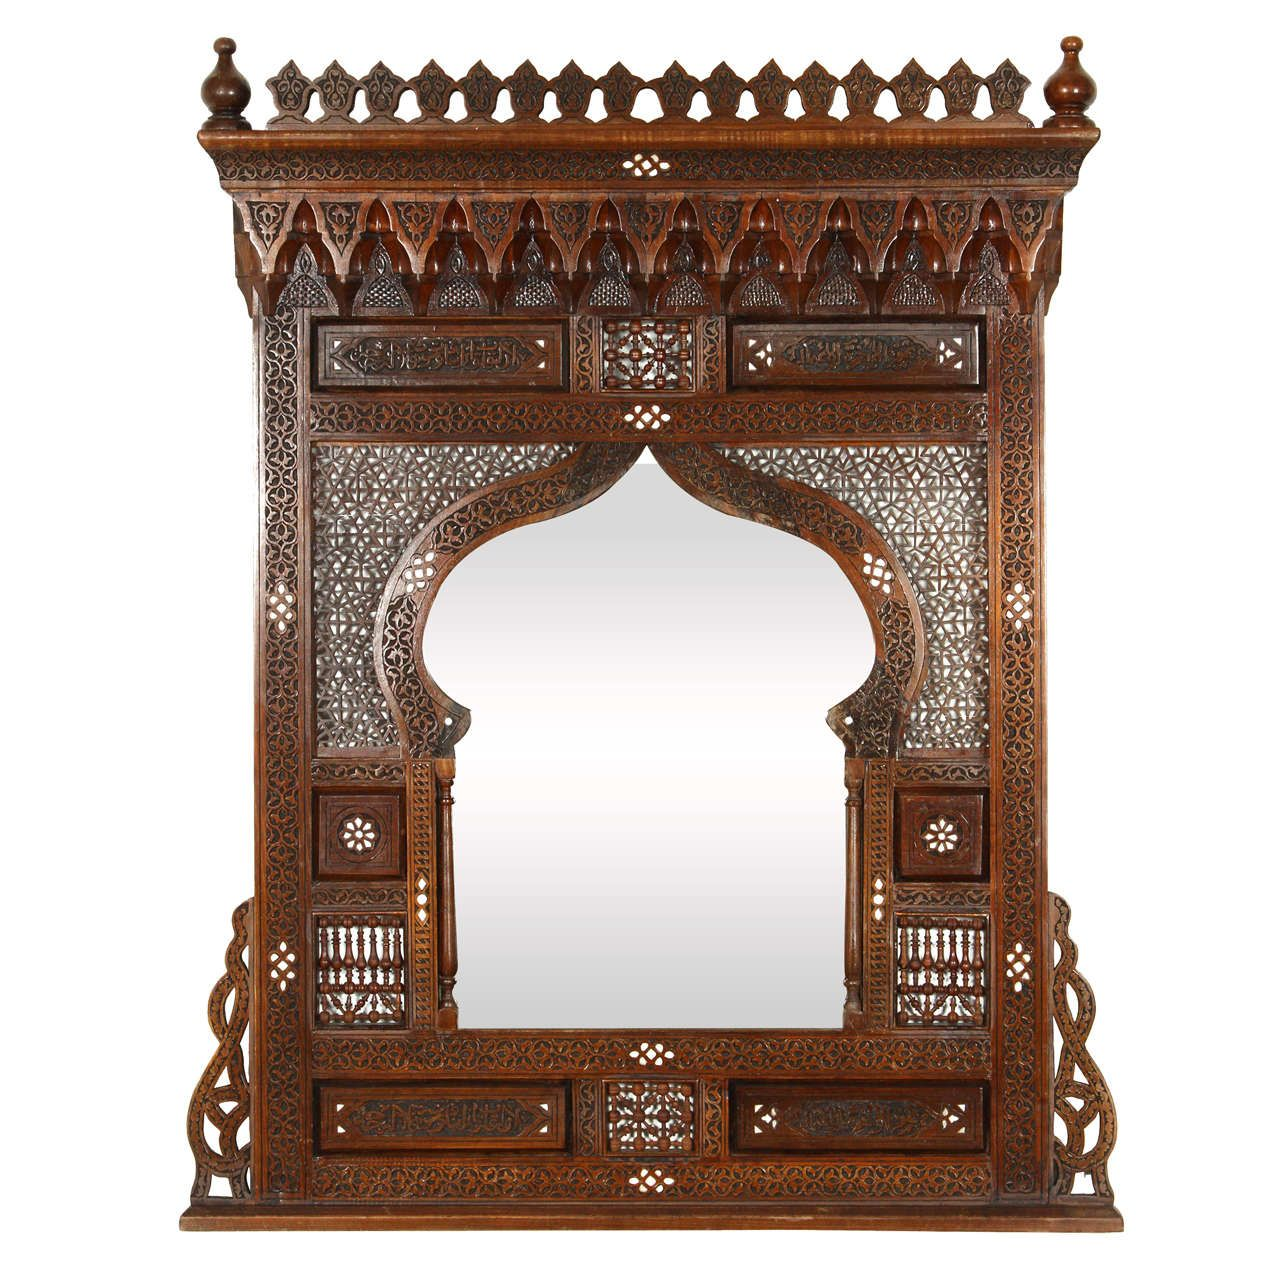 wooden mirror Luxurious handmade mirror mother of pearl inlaid Wall mirror Moroccan mirror decor Mirror Syrian style mirror